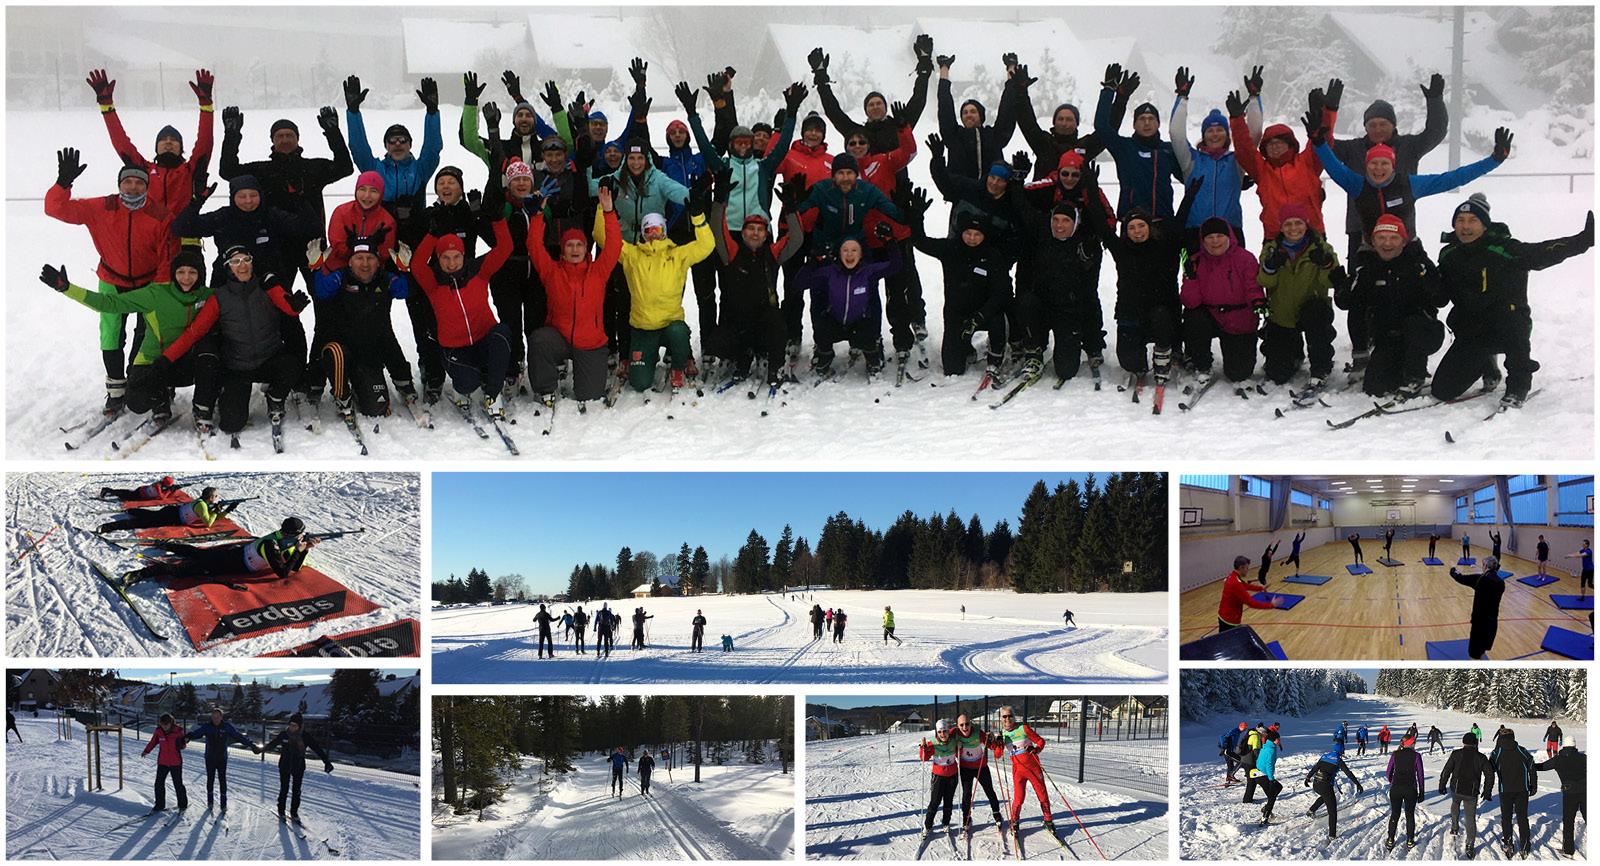 Nordisch aktiv Skilanglaufwochenende Oberhof I